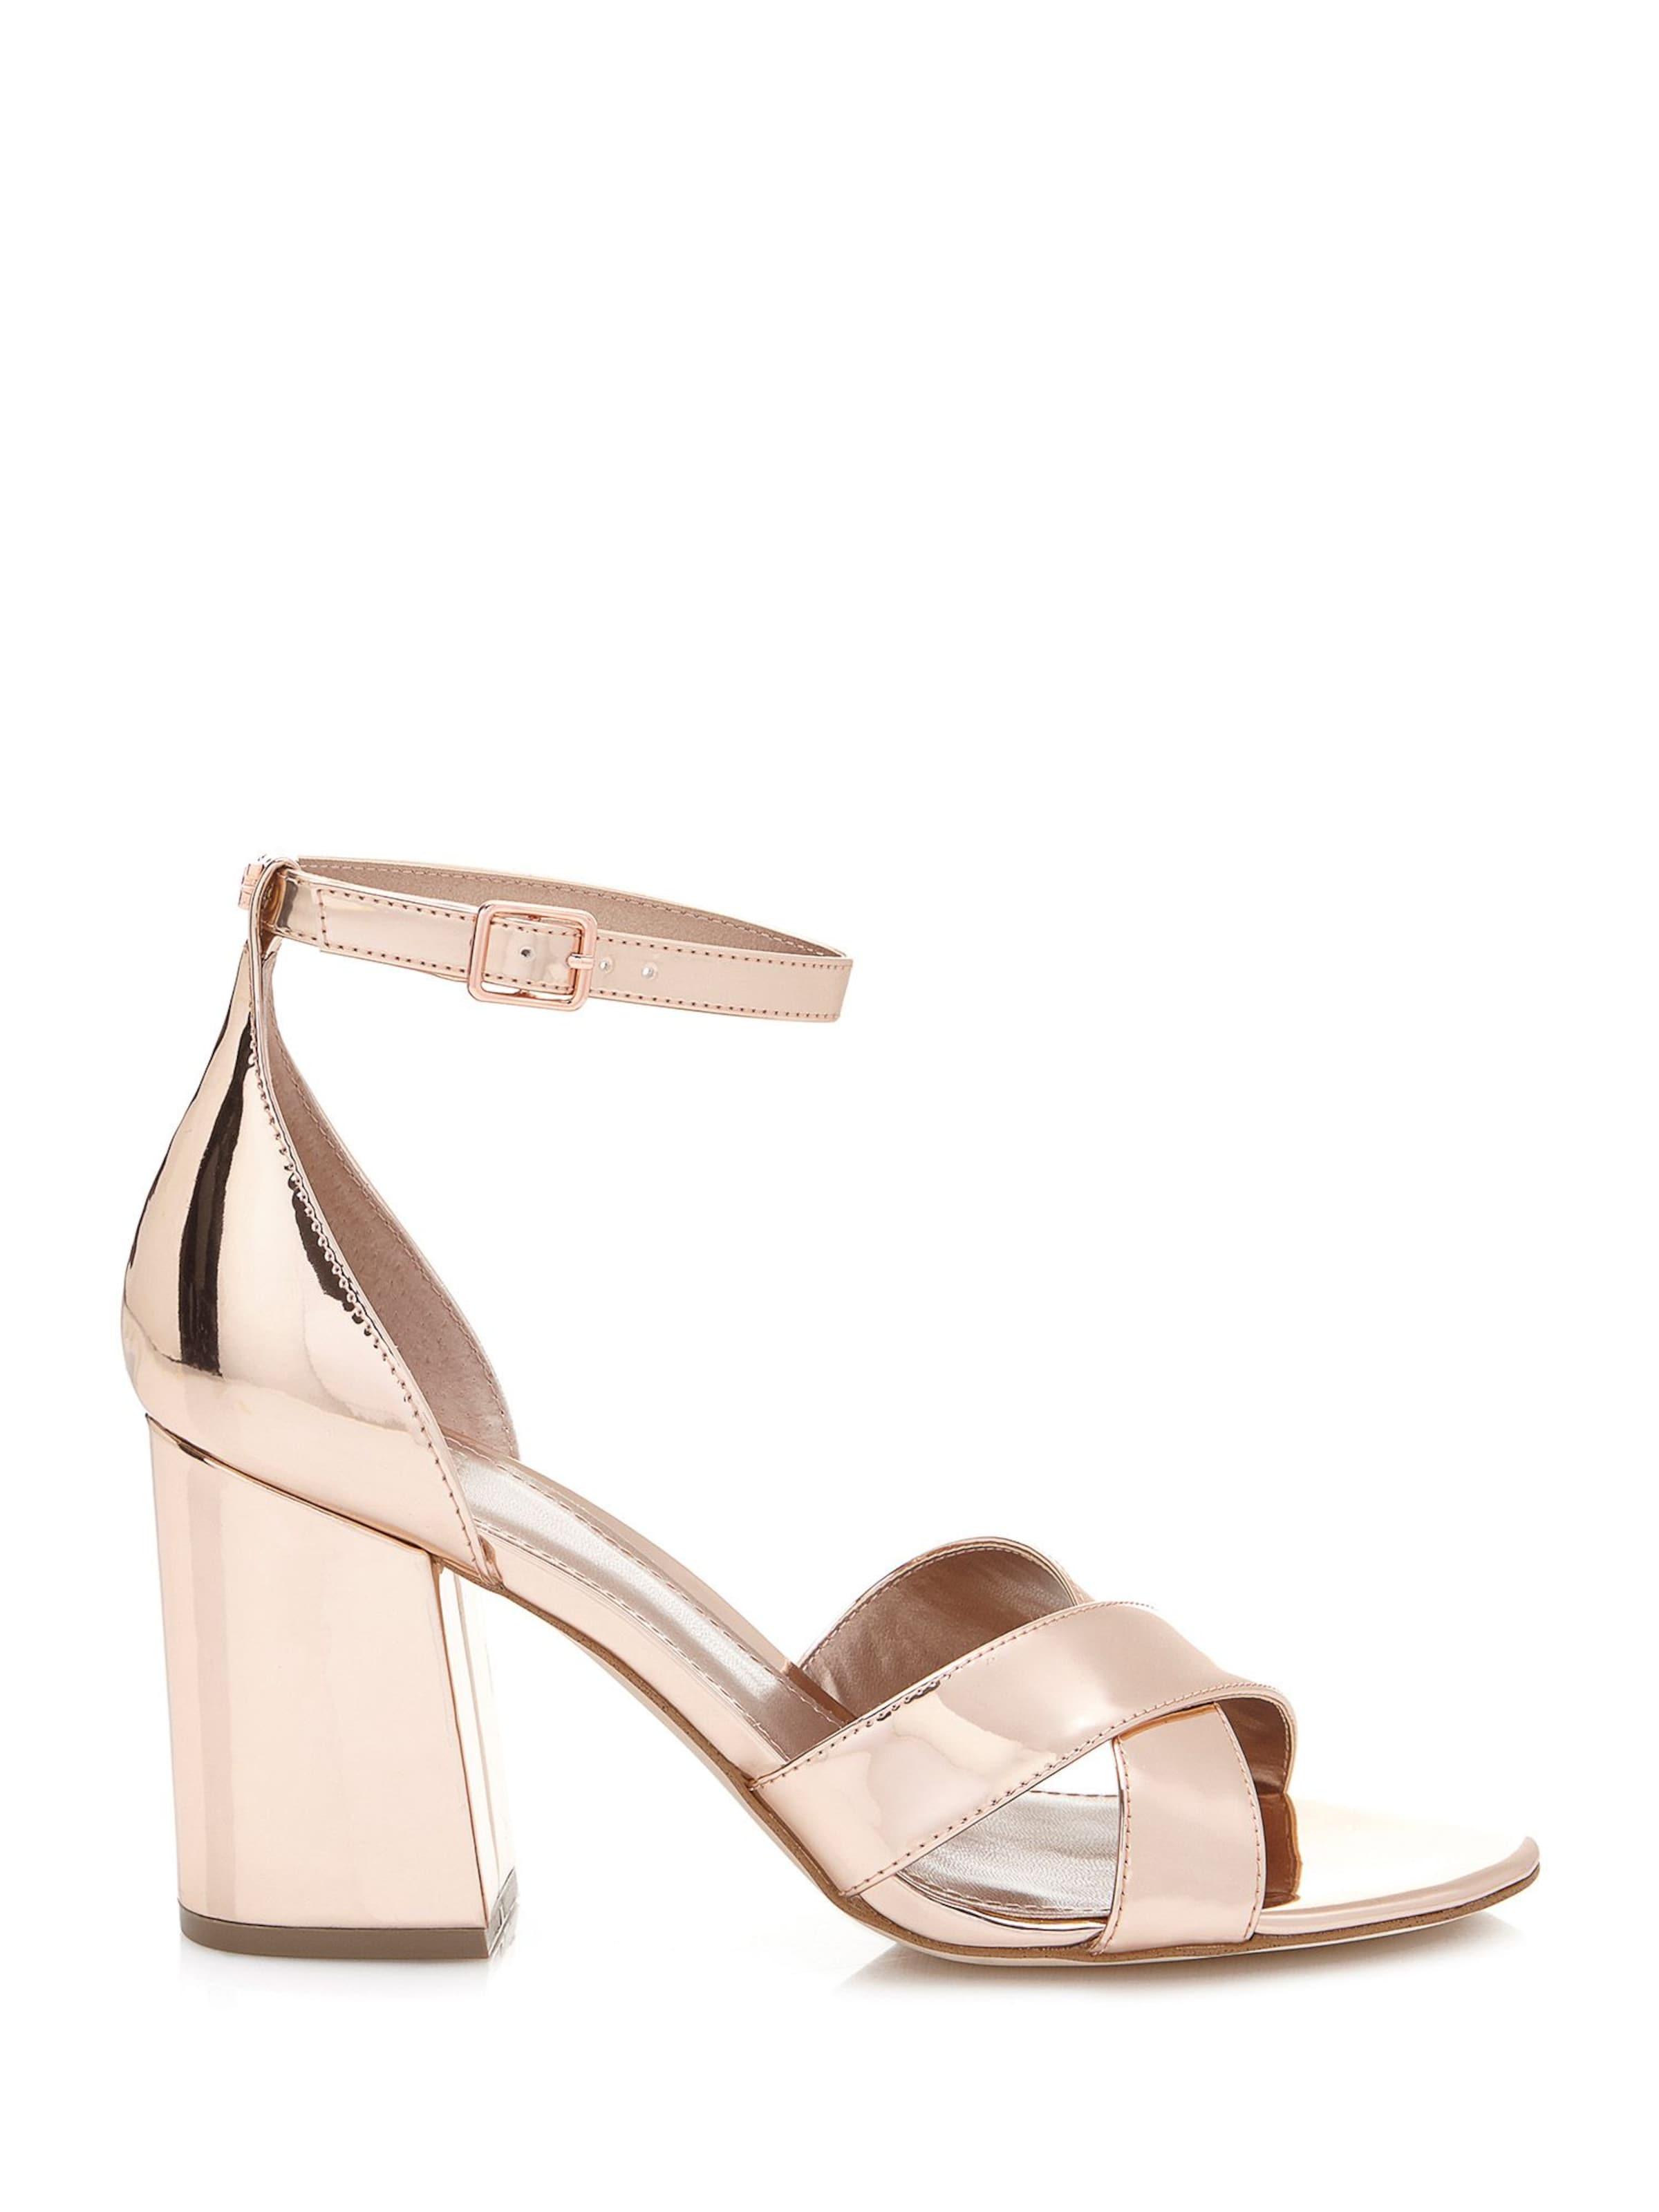 Haltbare Mode billige Schuhe GUESS | SANDALETTE Schuhe 'DALLA' Schuhe Gut getragene Schuhe SANDALETTE 2416b8